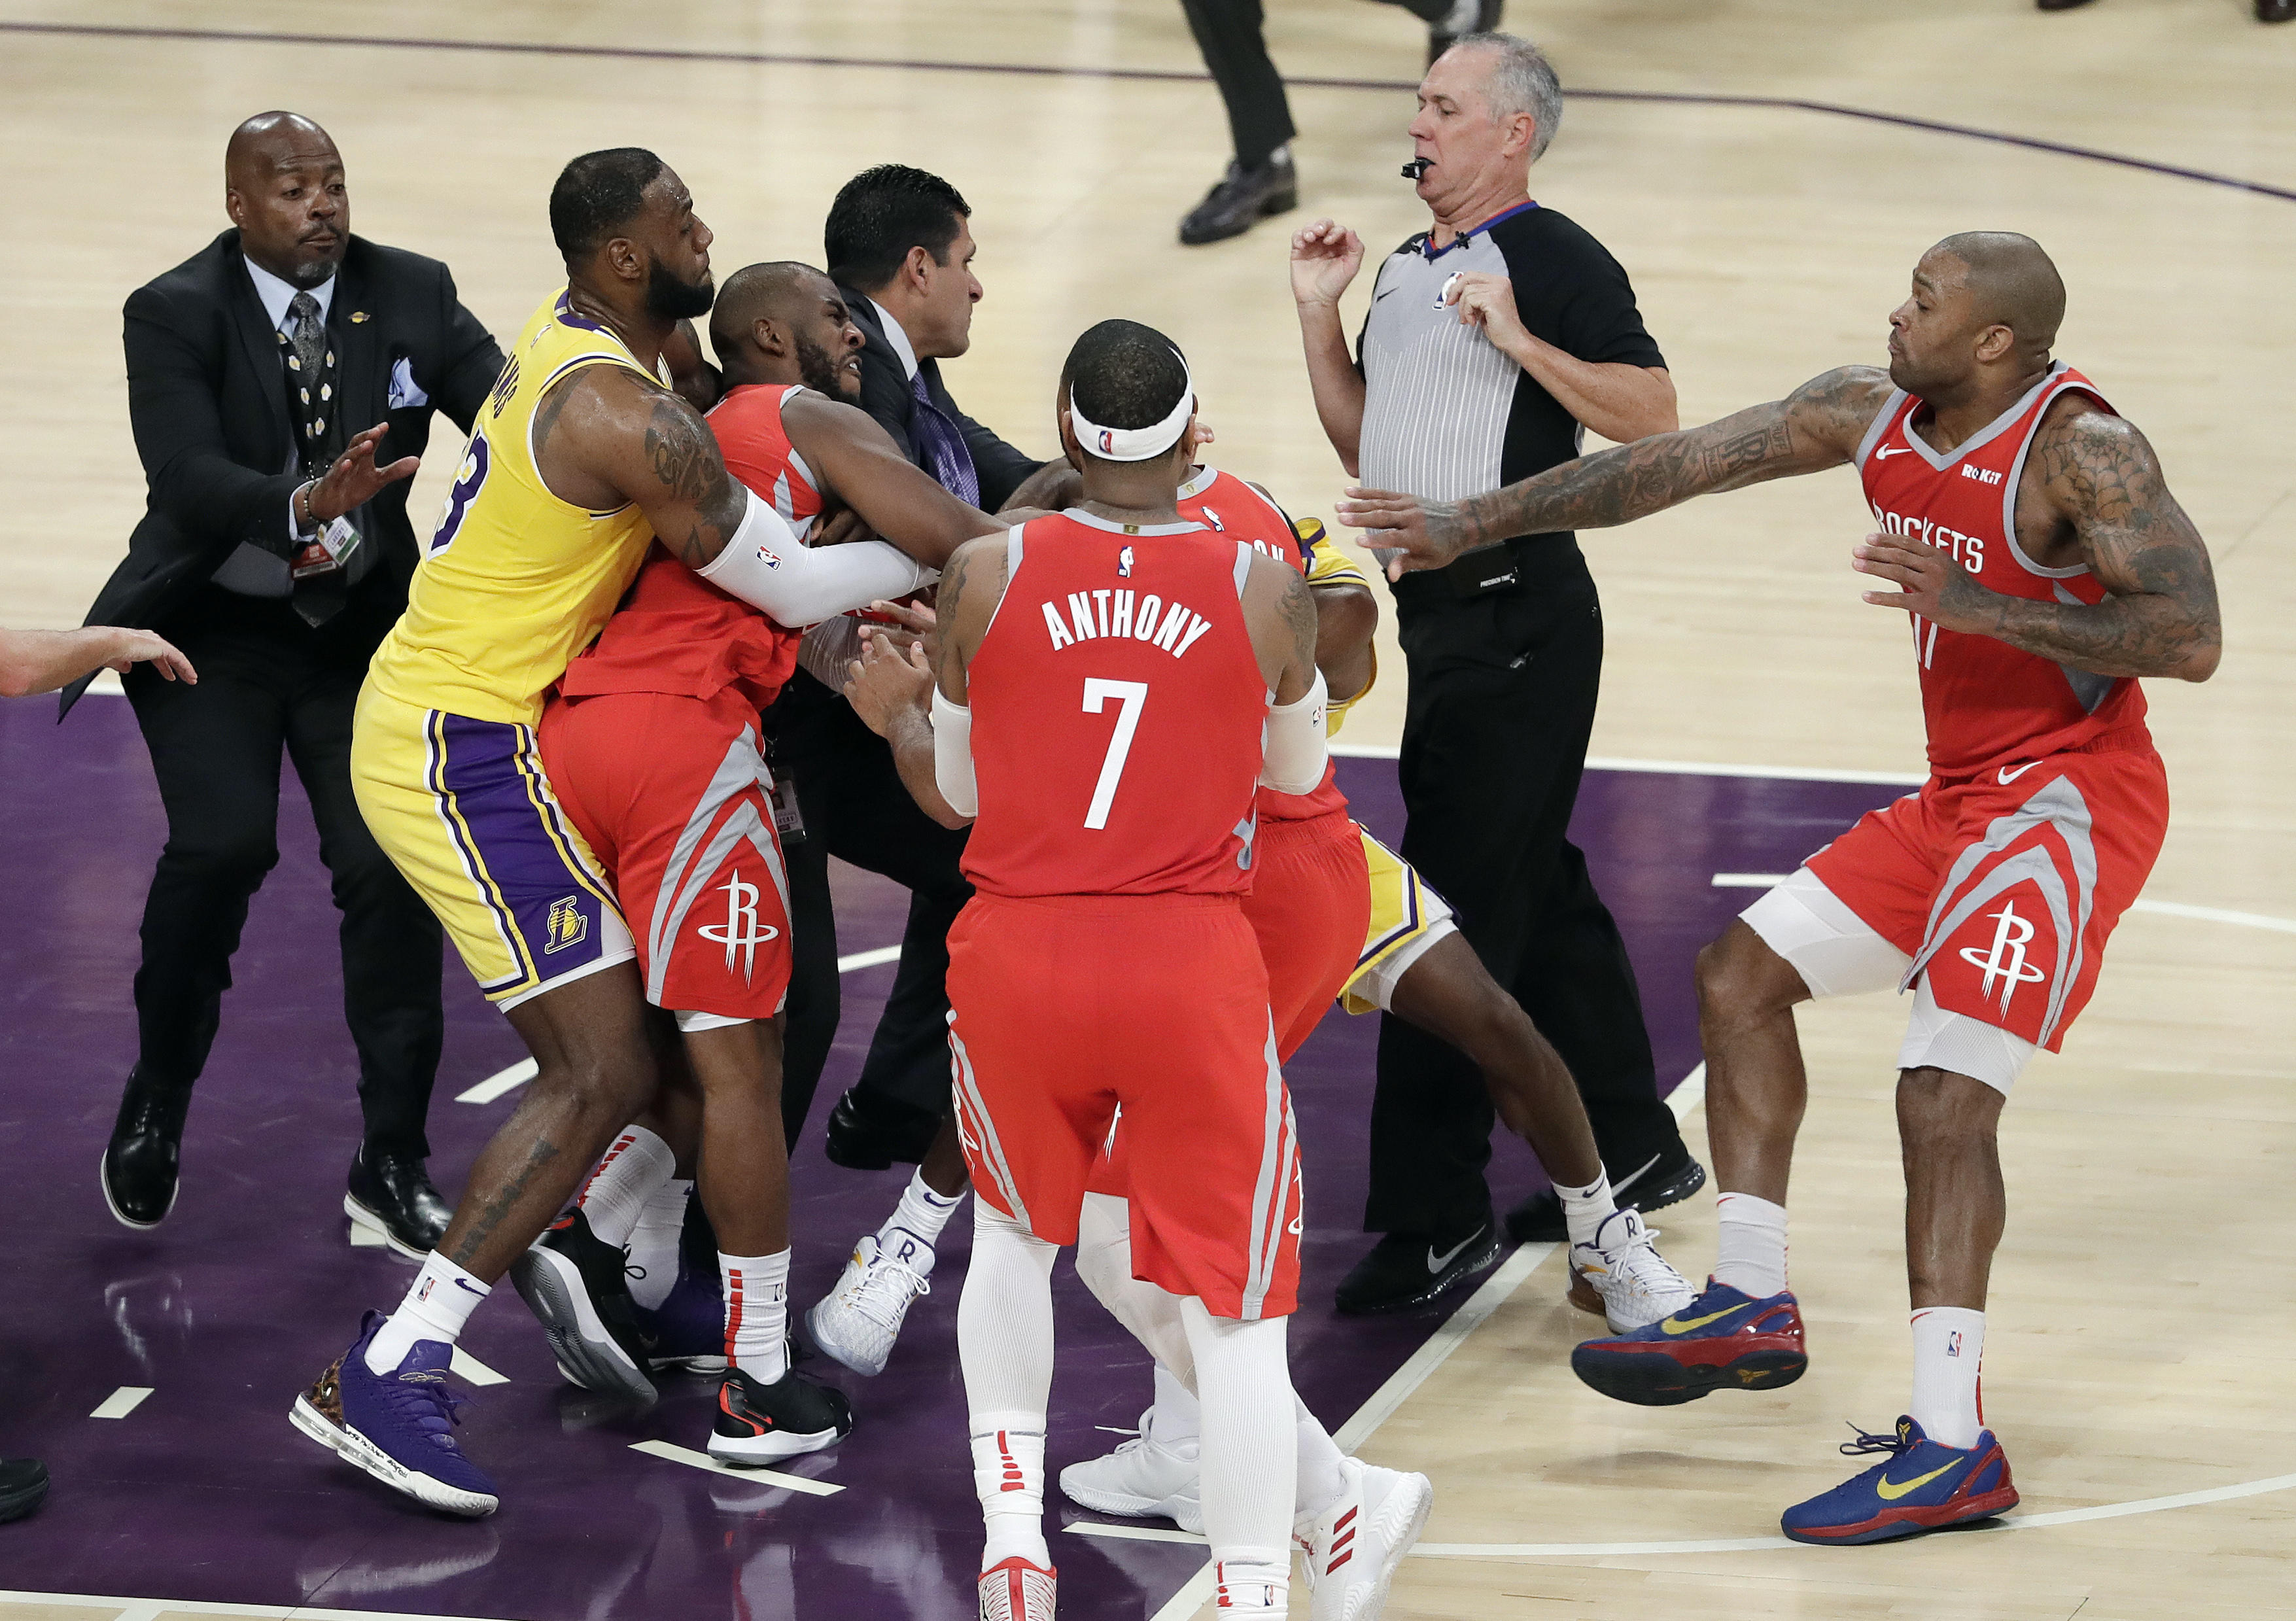 69fb36c143d9 Brawl breaks out between Lakers